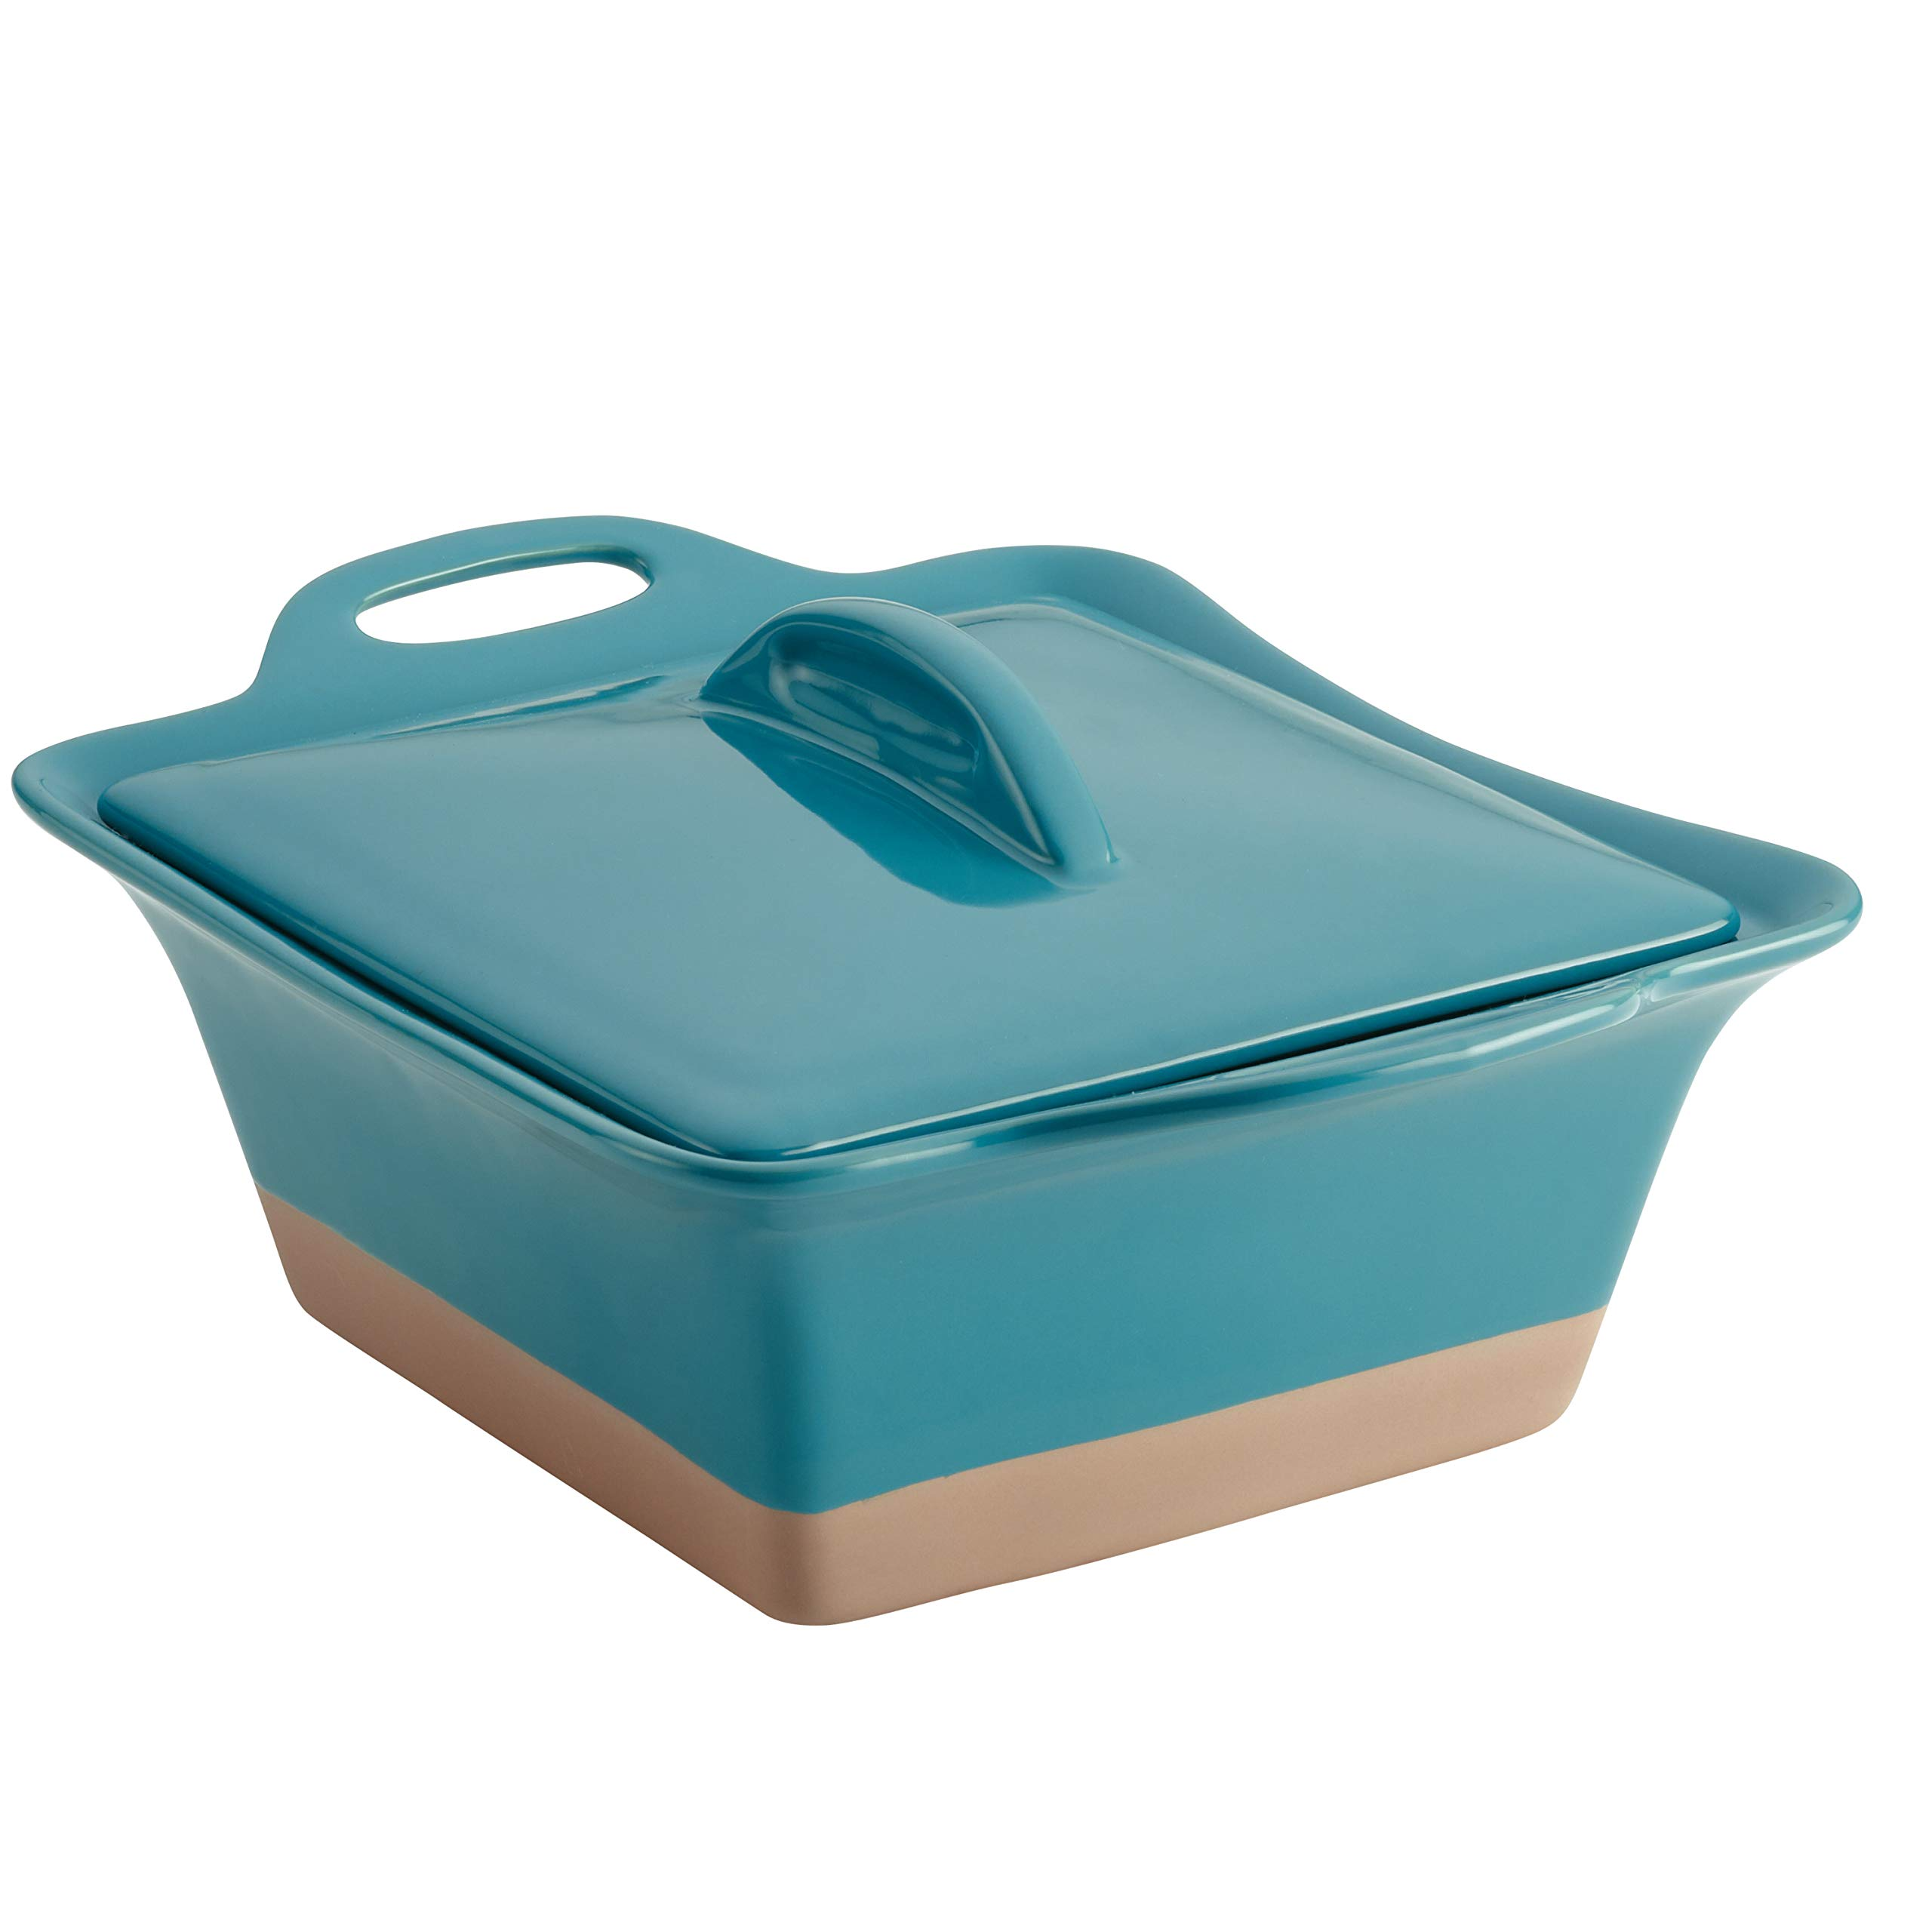 Rachael Ray 47148 2.5-Qt. Square Stoneware Casserole, Quart, Turquoise